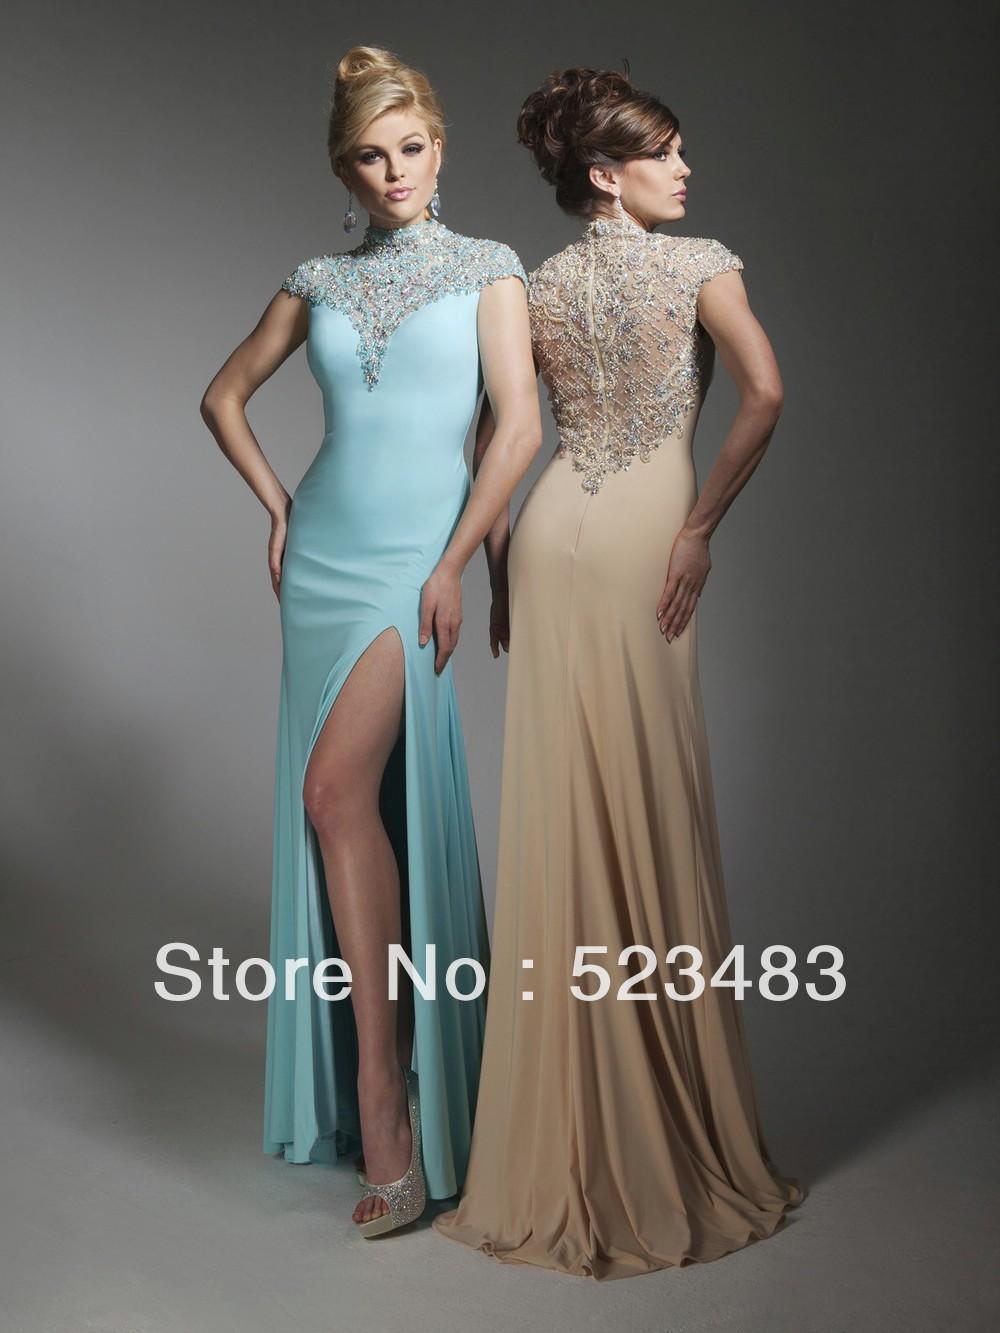 Classy Evening Dresses For Weddings 9